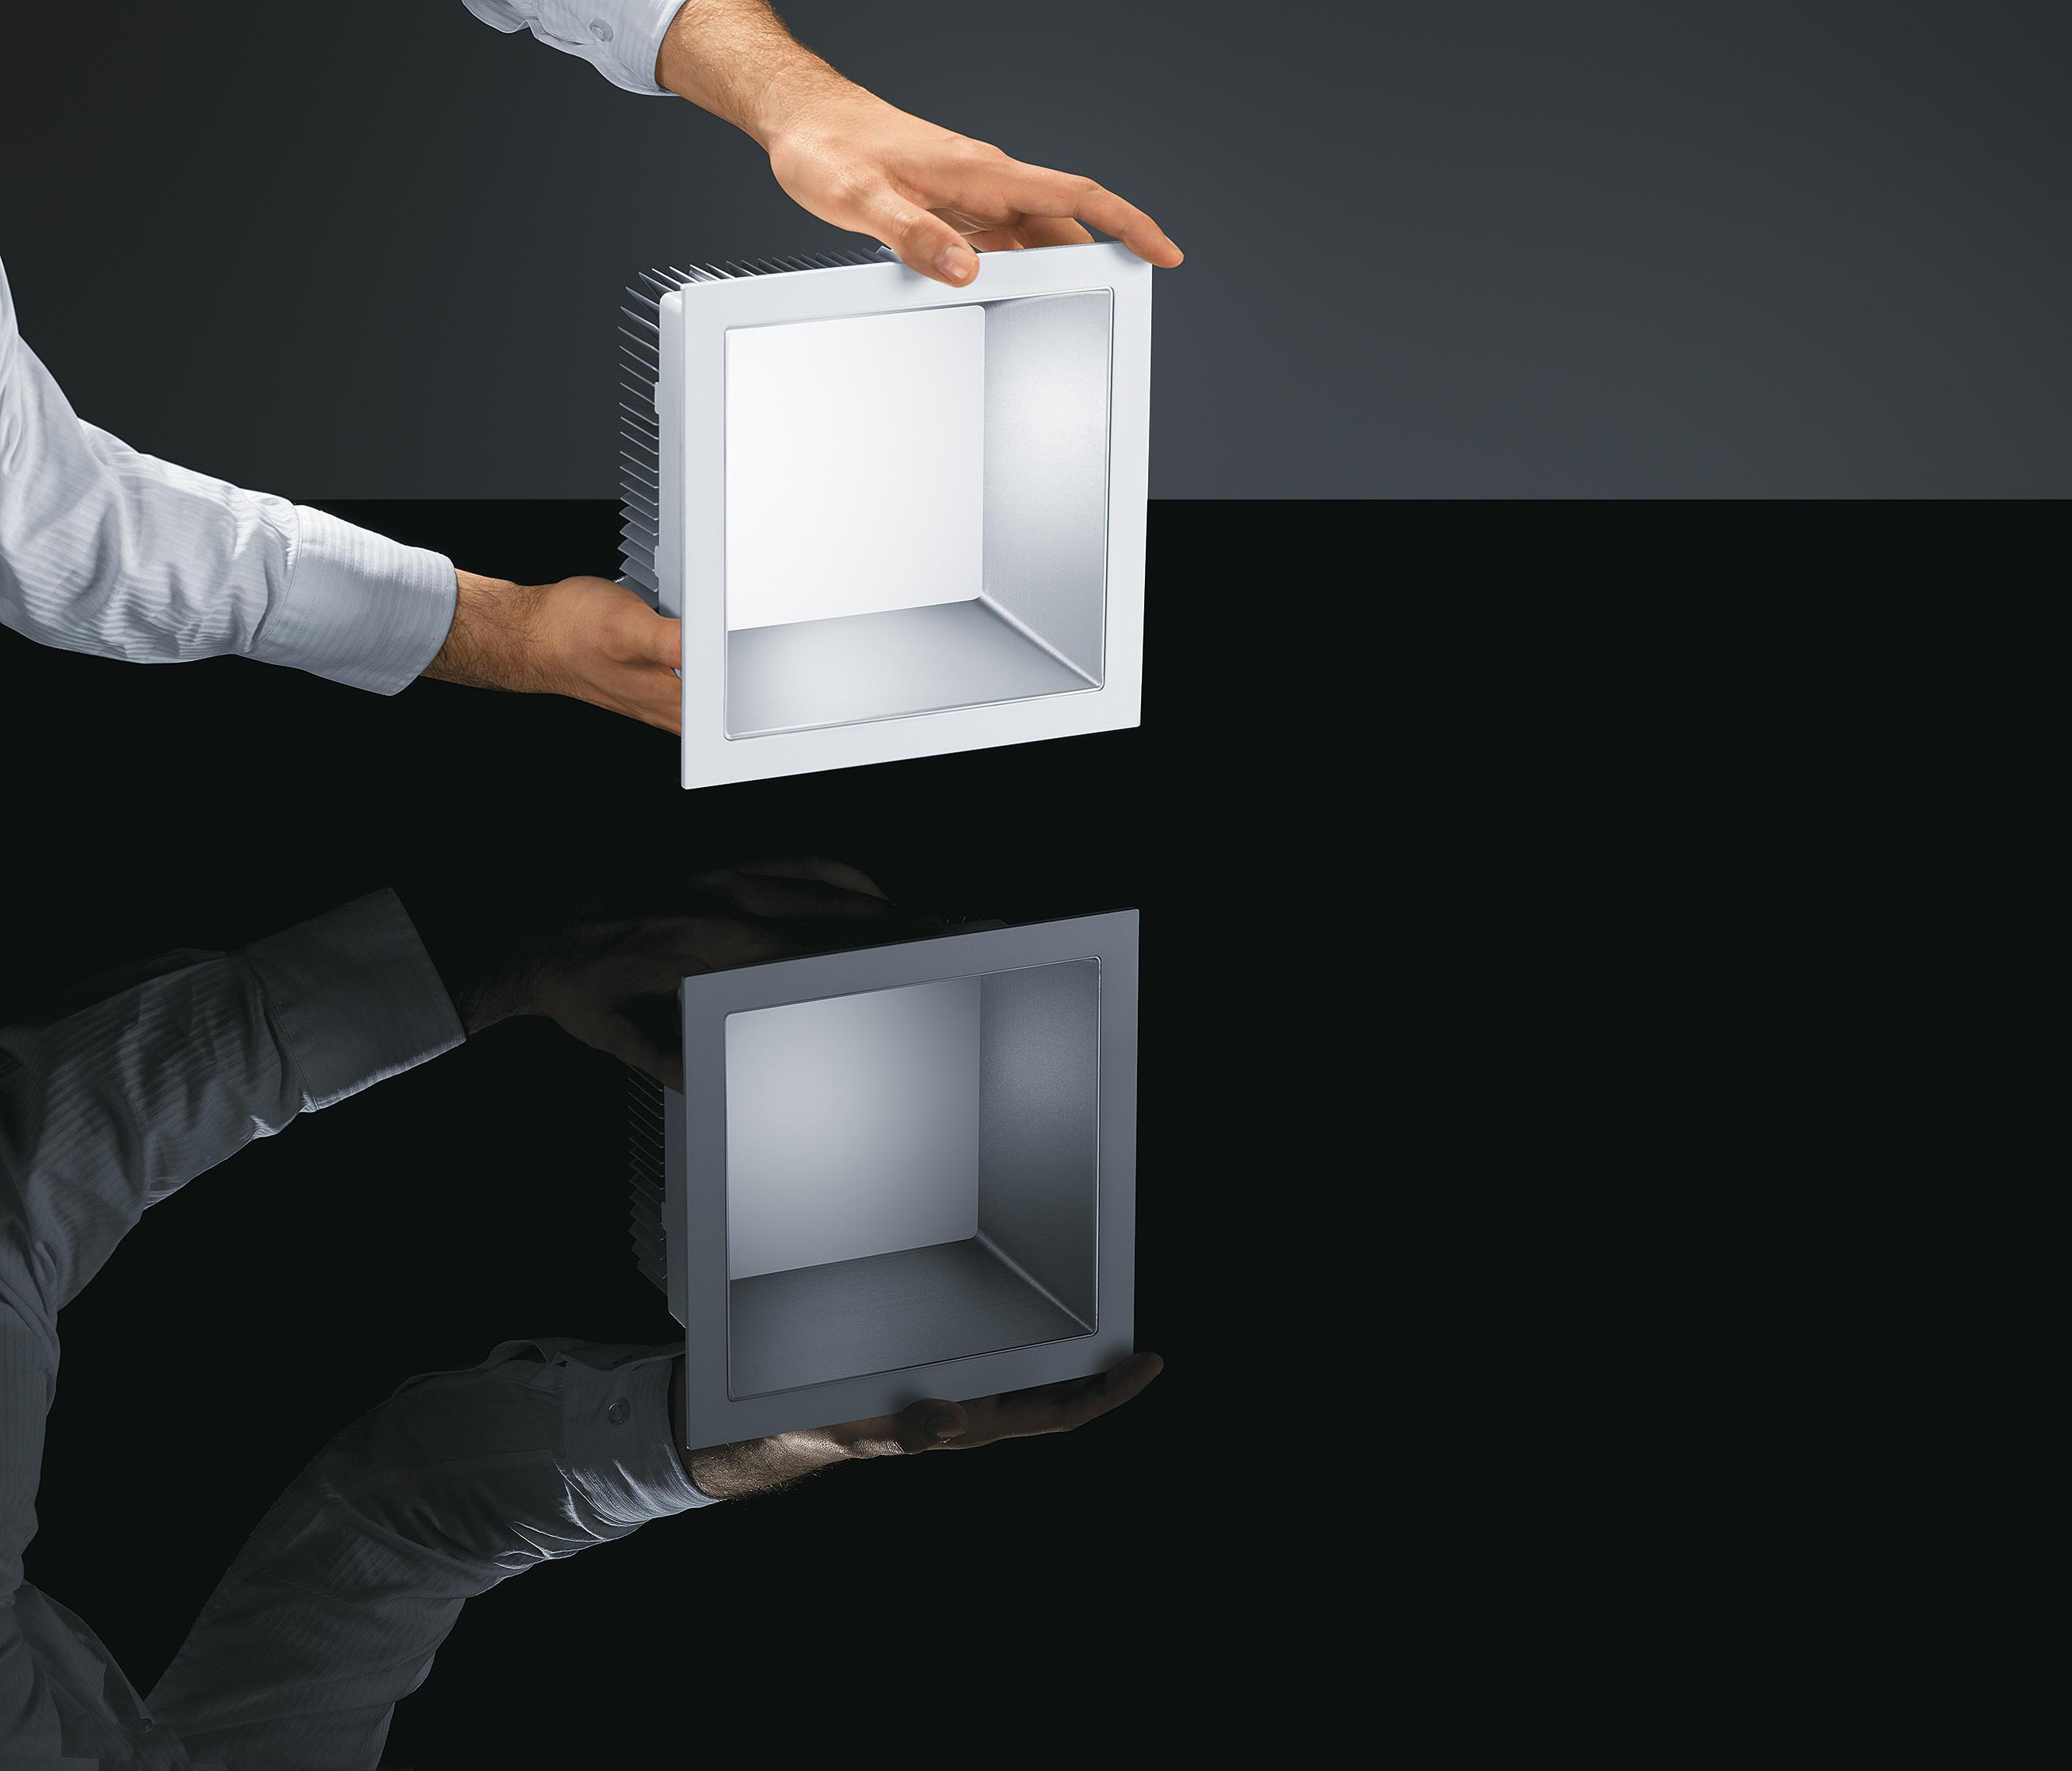 panos infinity q h spotlights from zumtobel lighting architonic. Black Bedroom Furniture Sets. Home Design Ideas